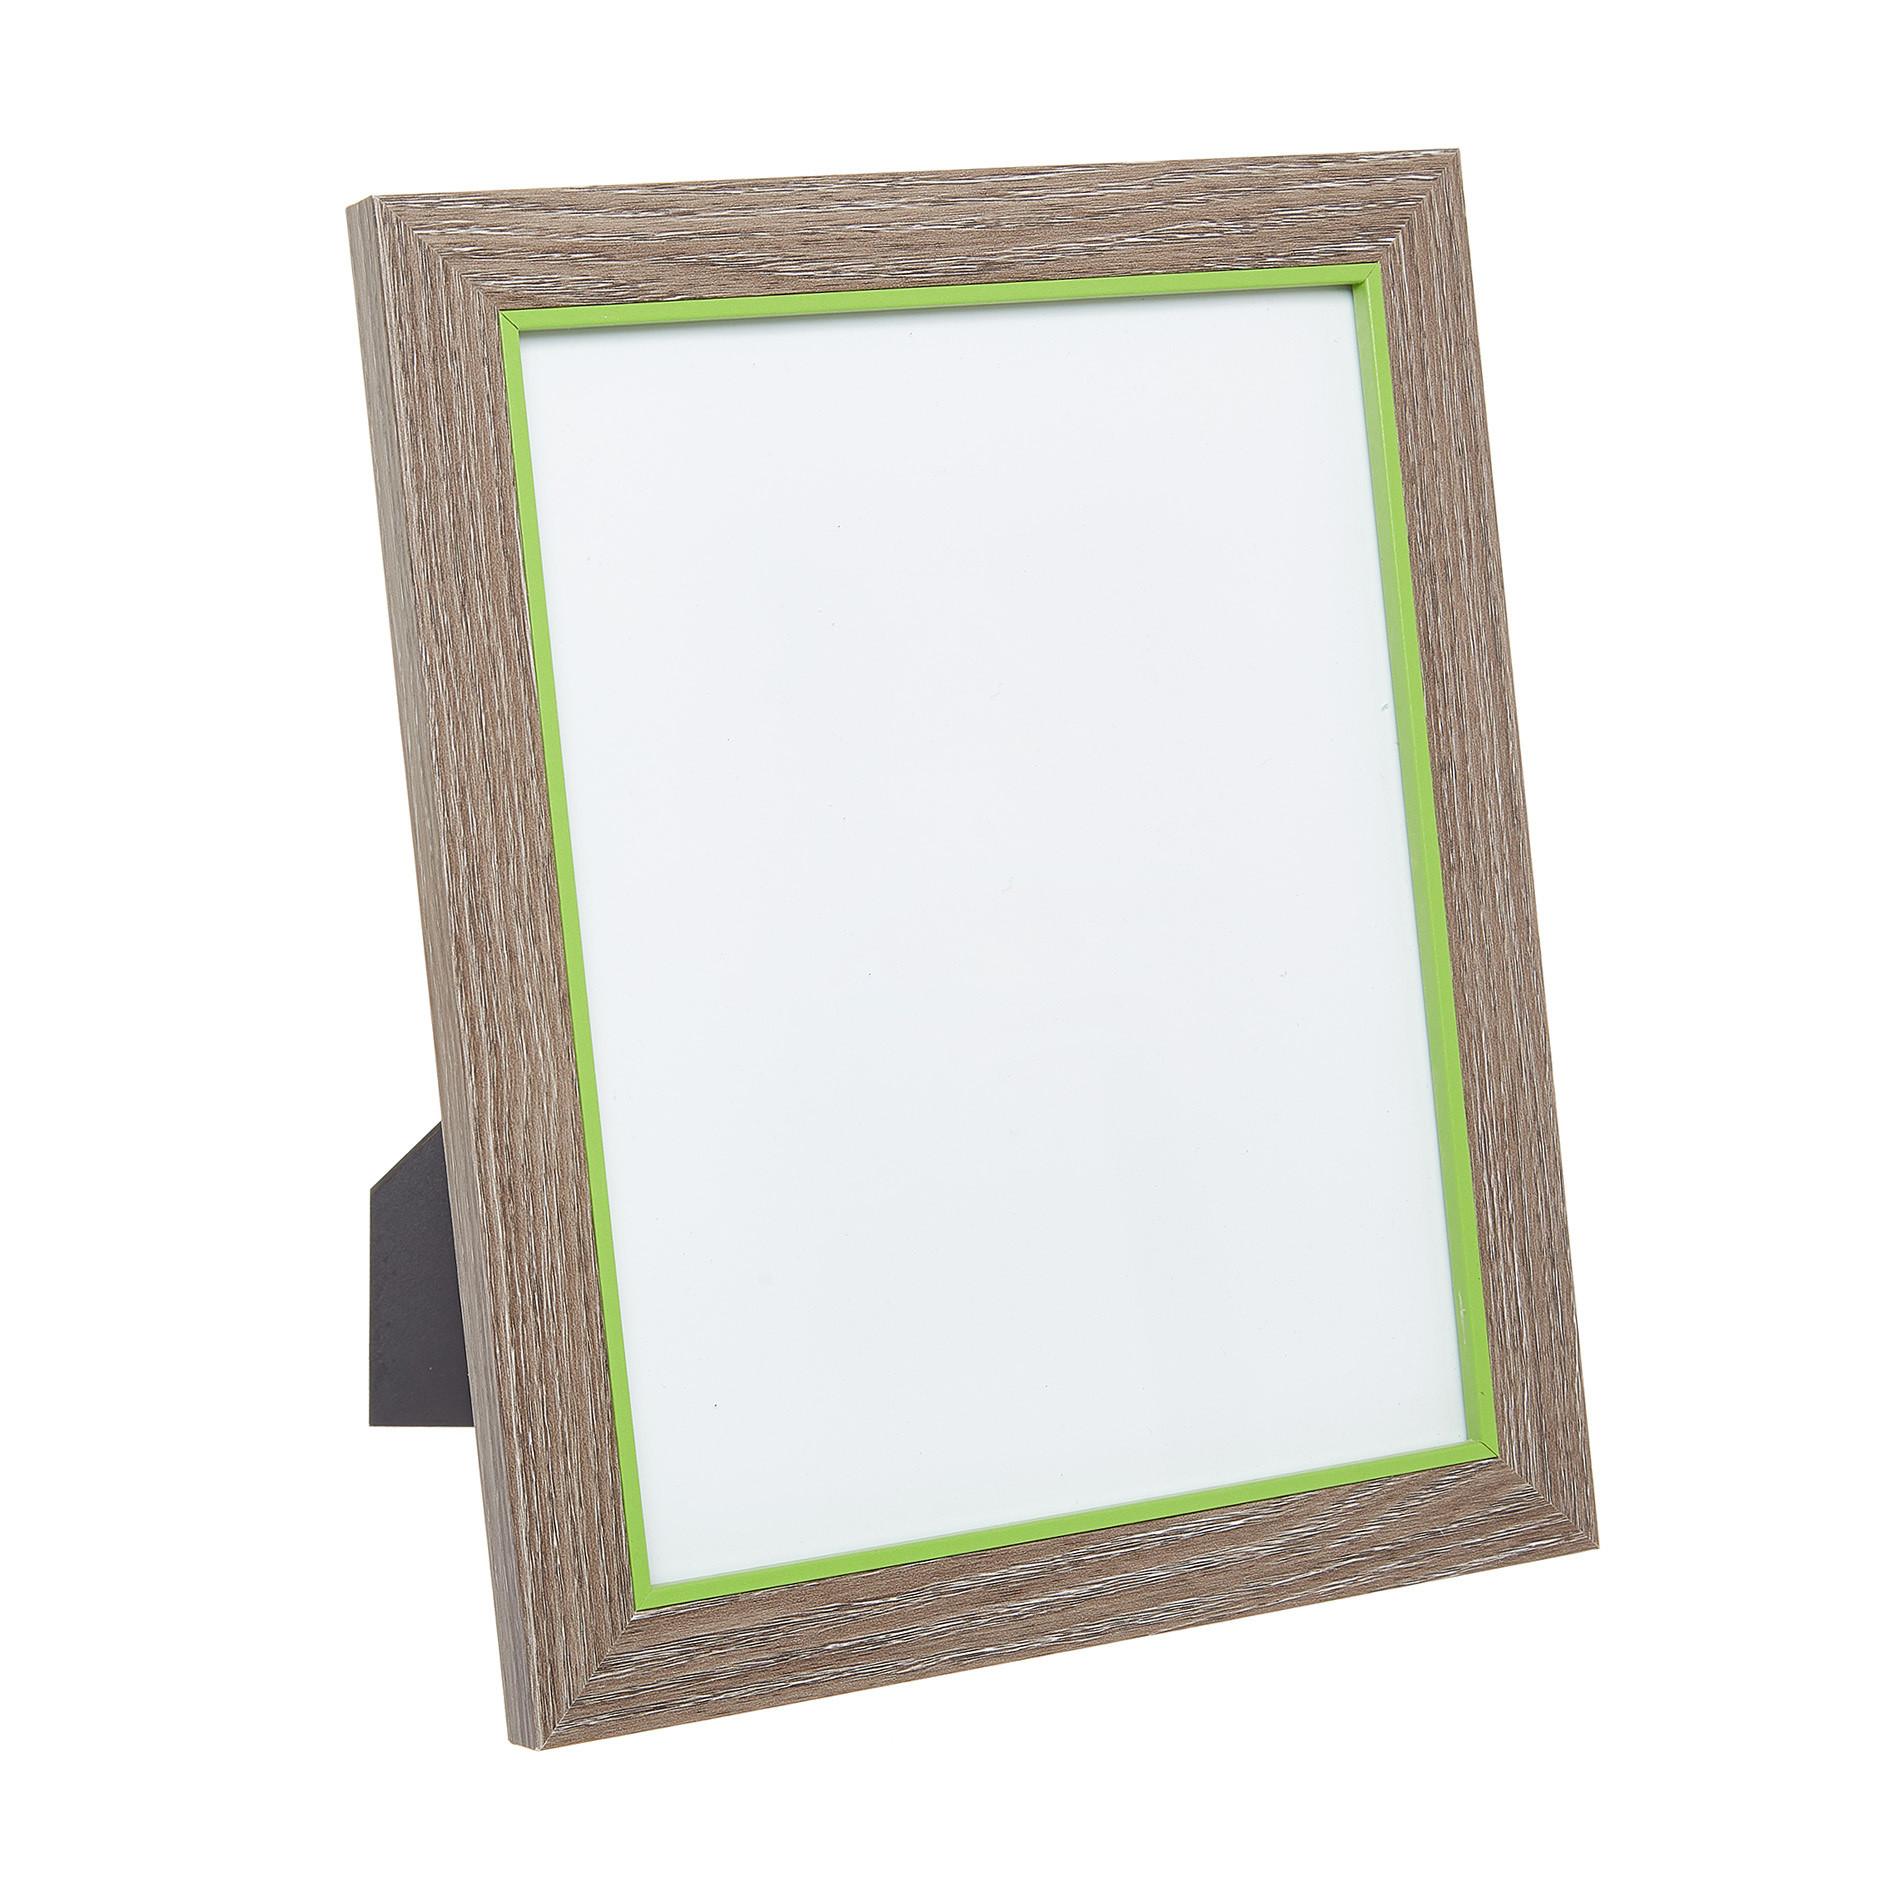 Portafoto cornice legno bicolore, Trasparente, large image number 0